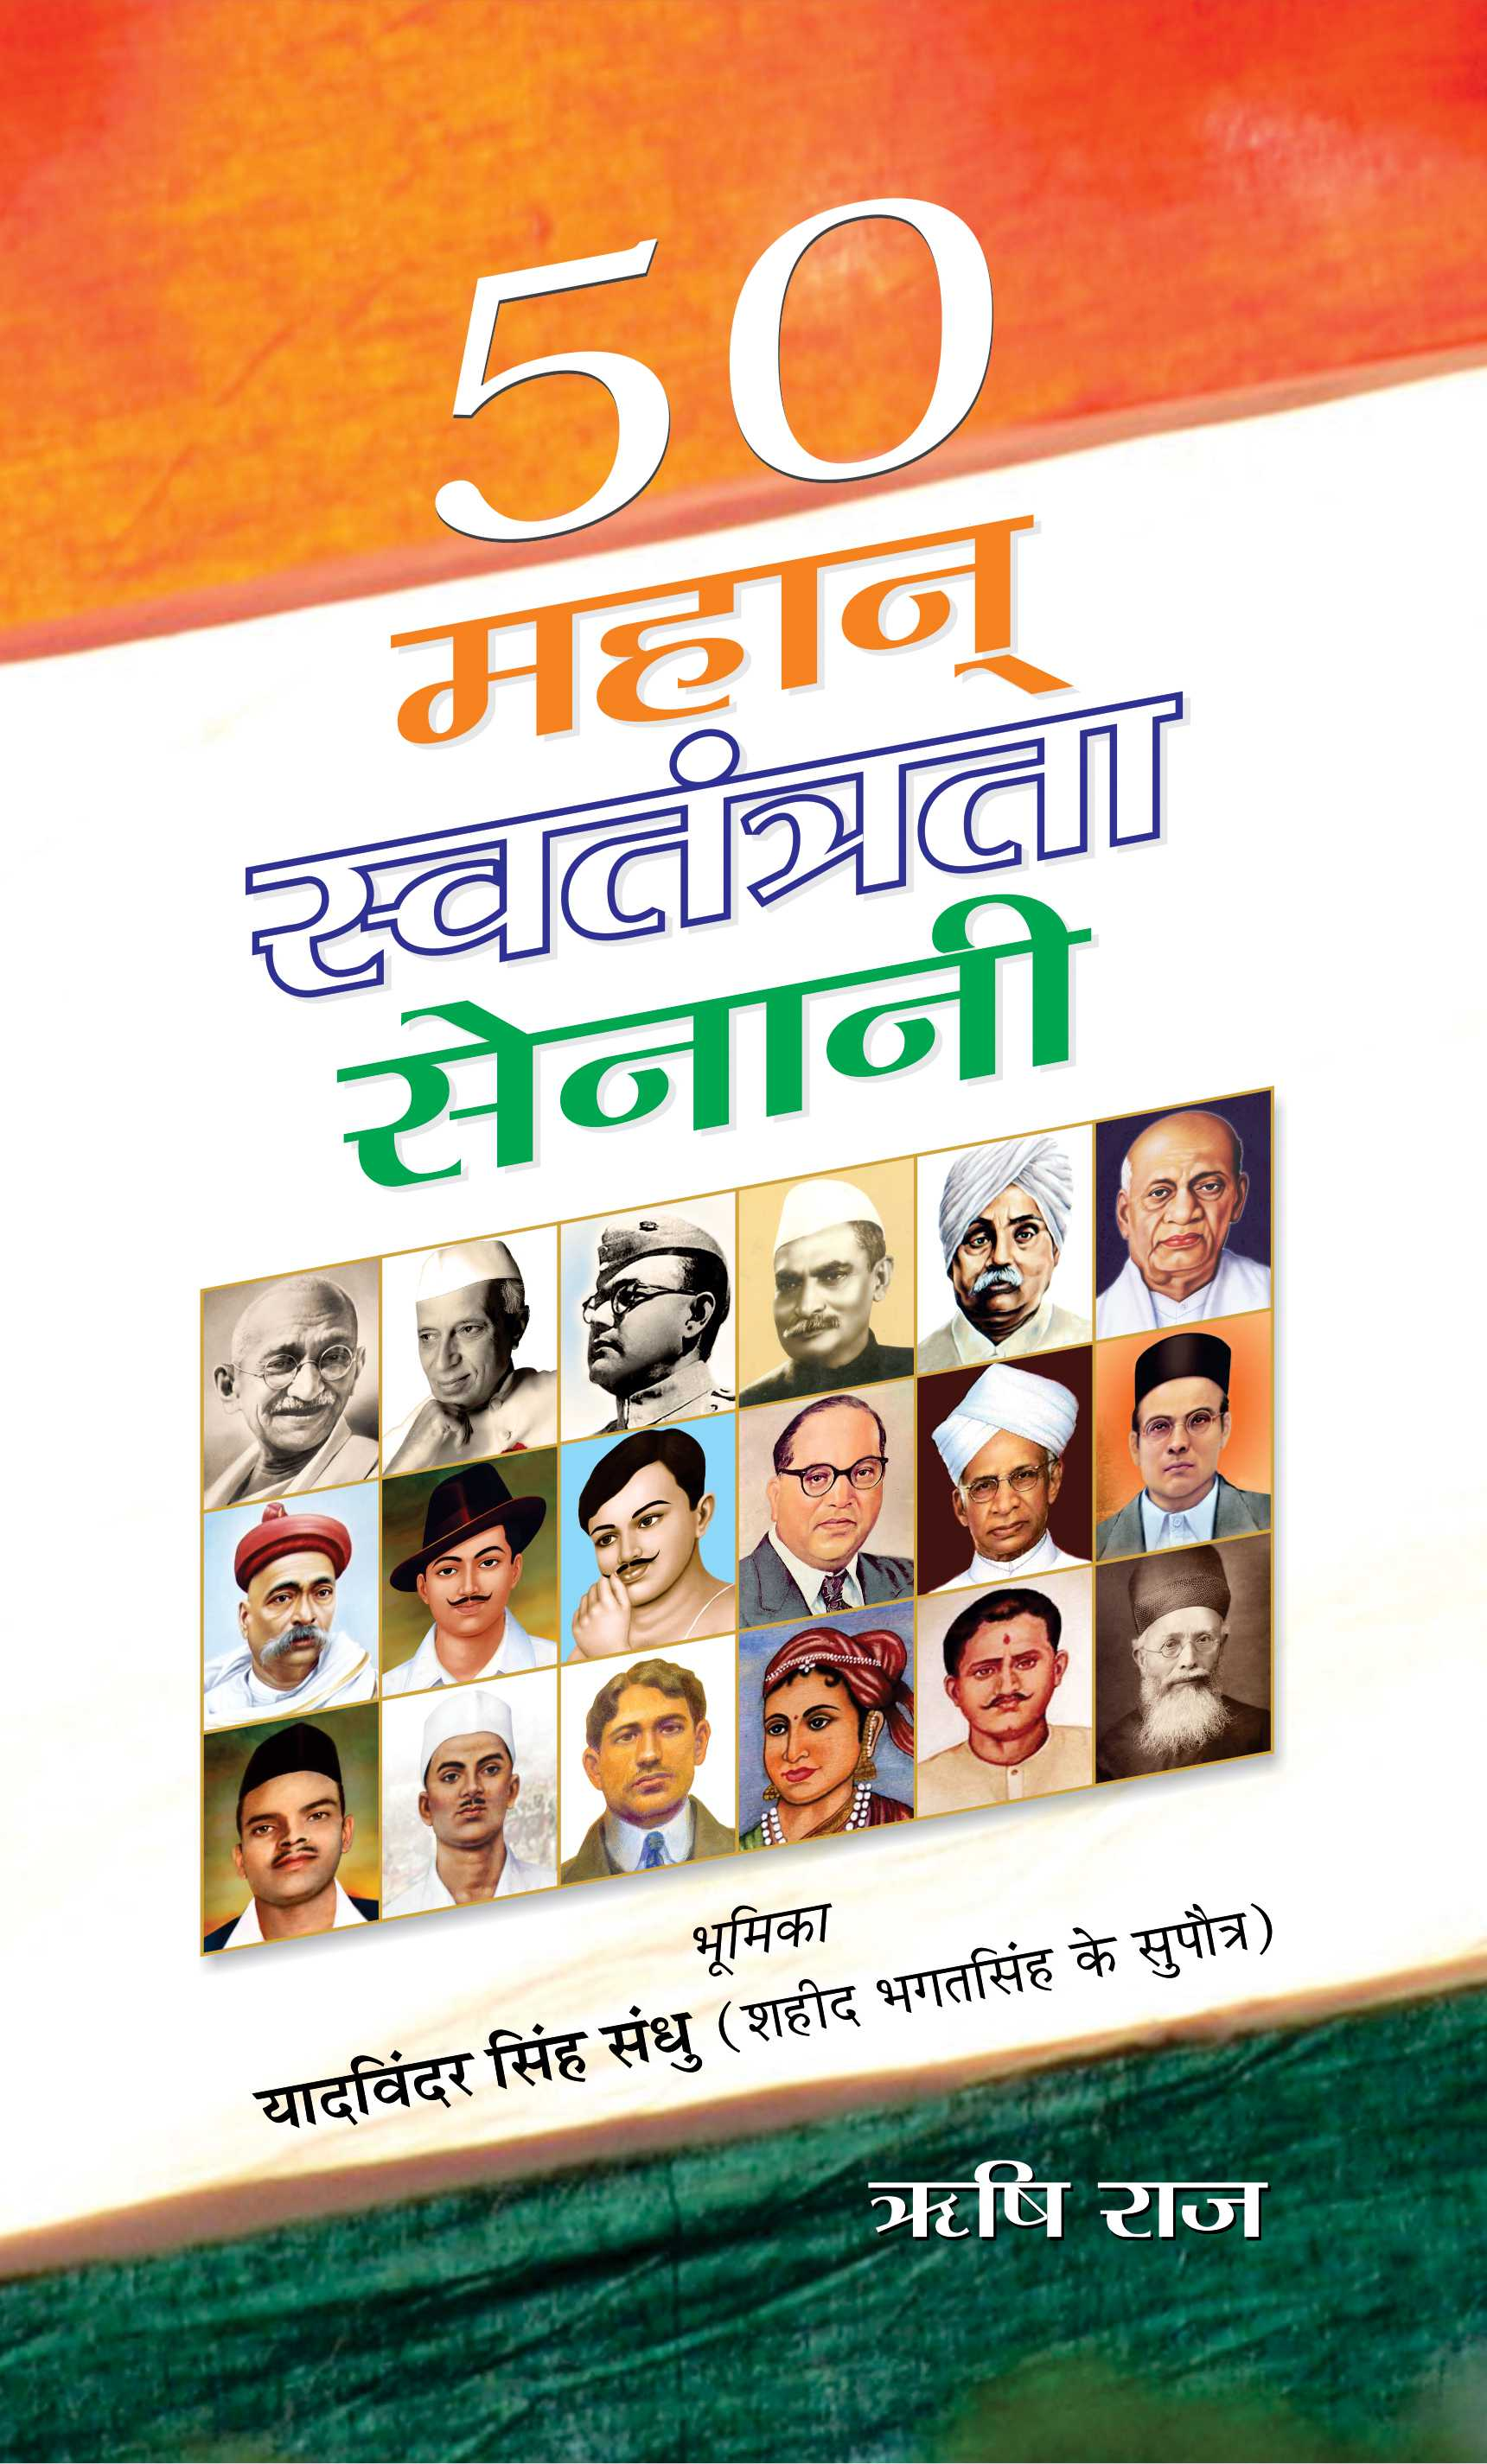 50 Mahan Swatantrata Senani